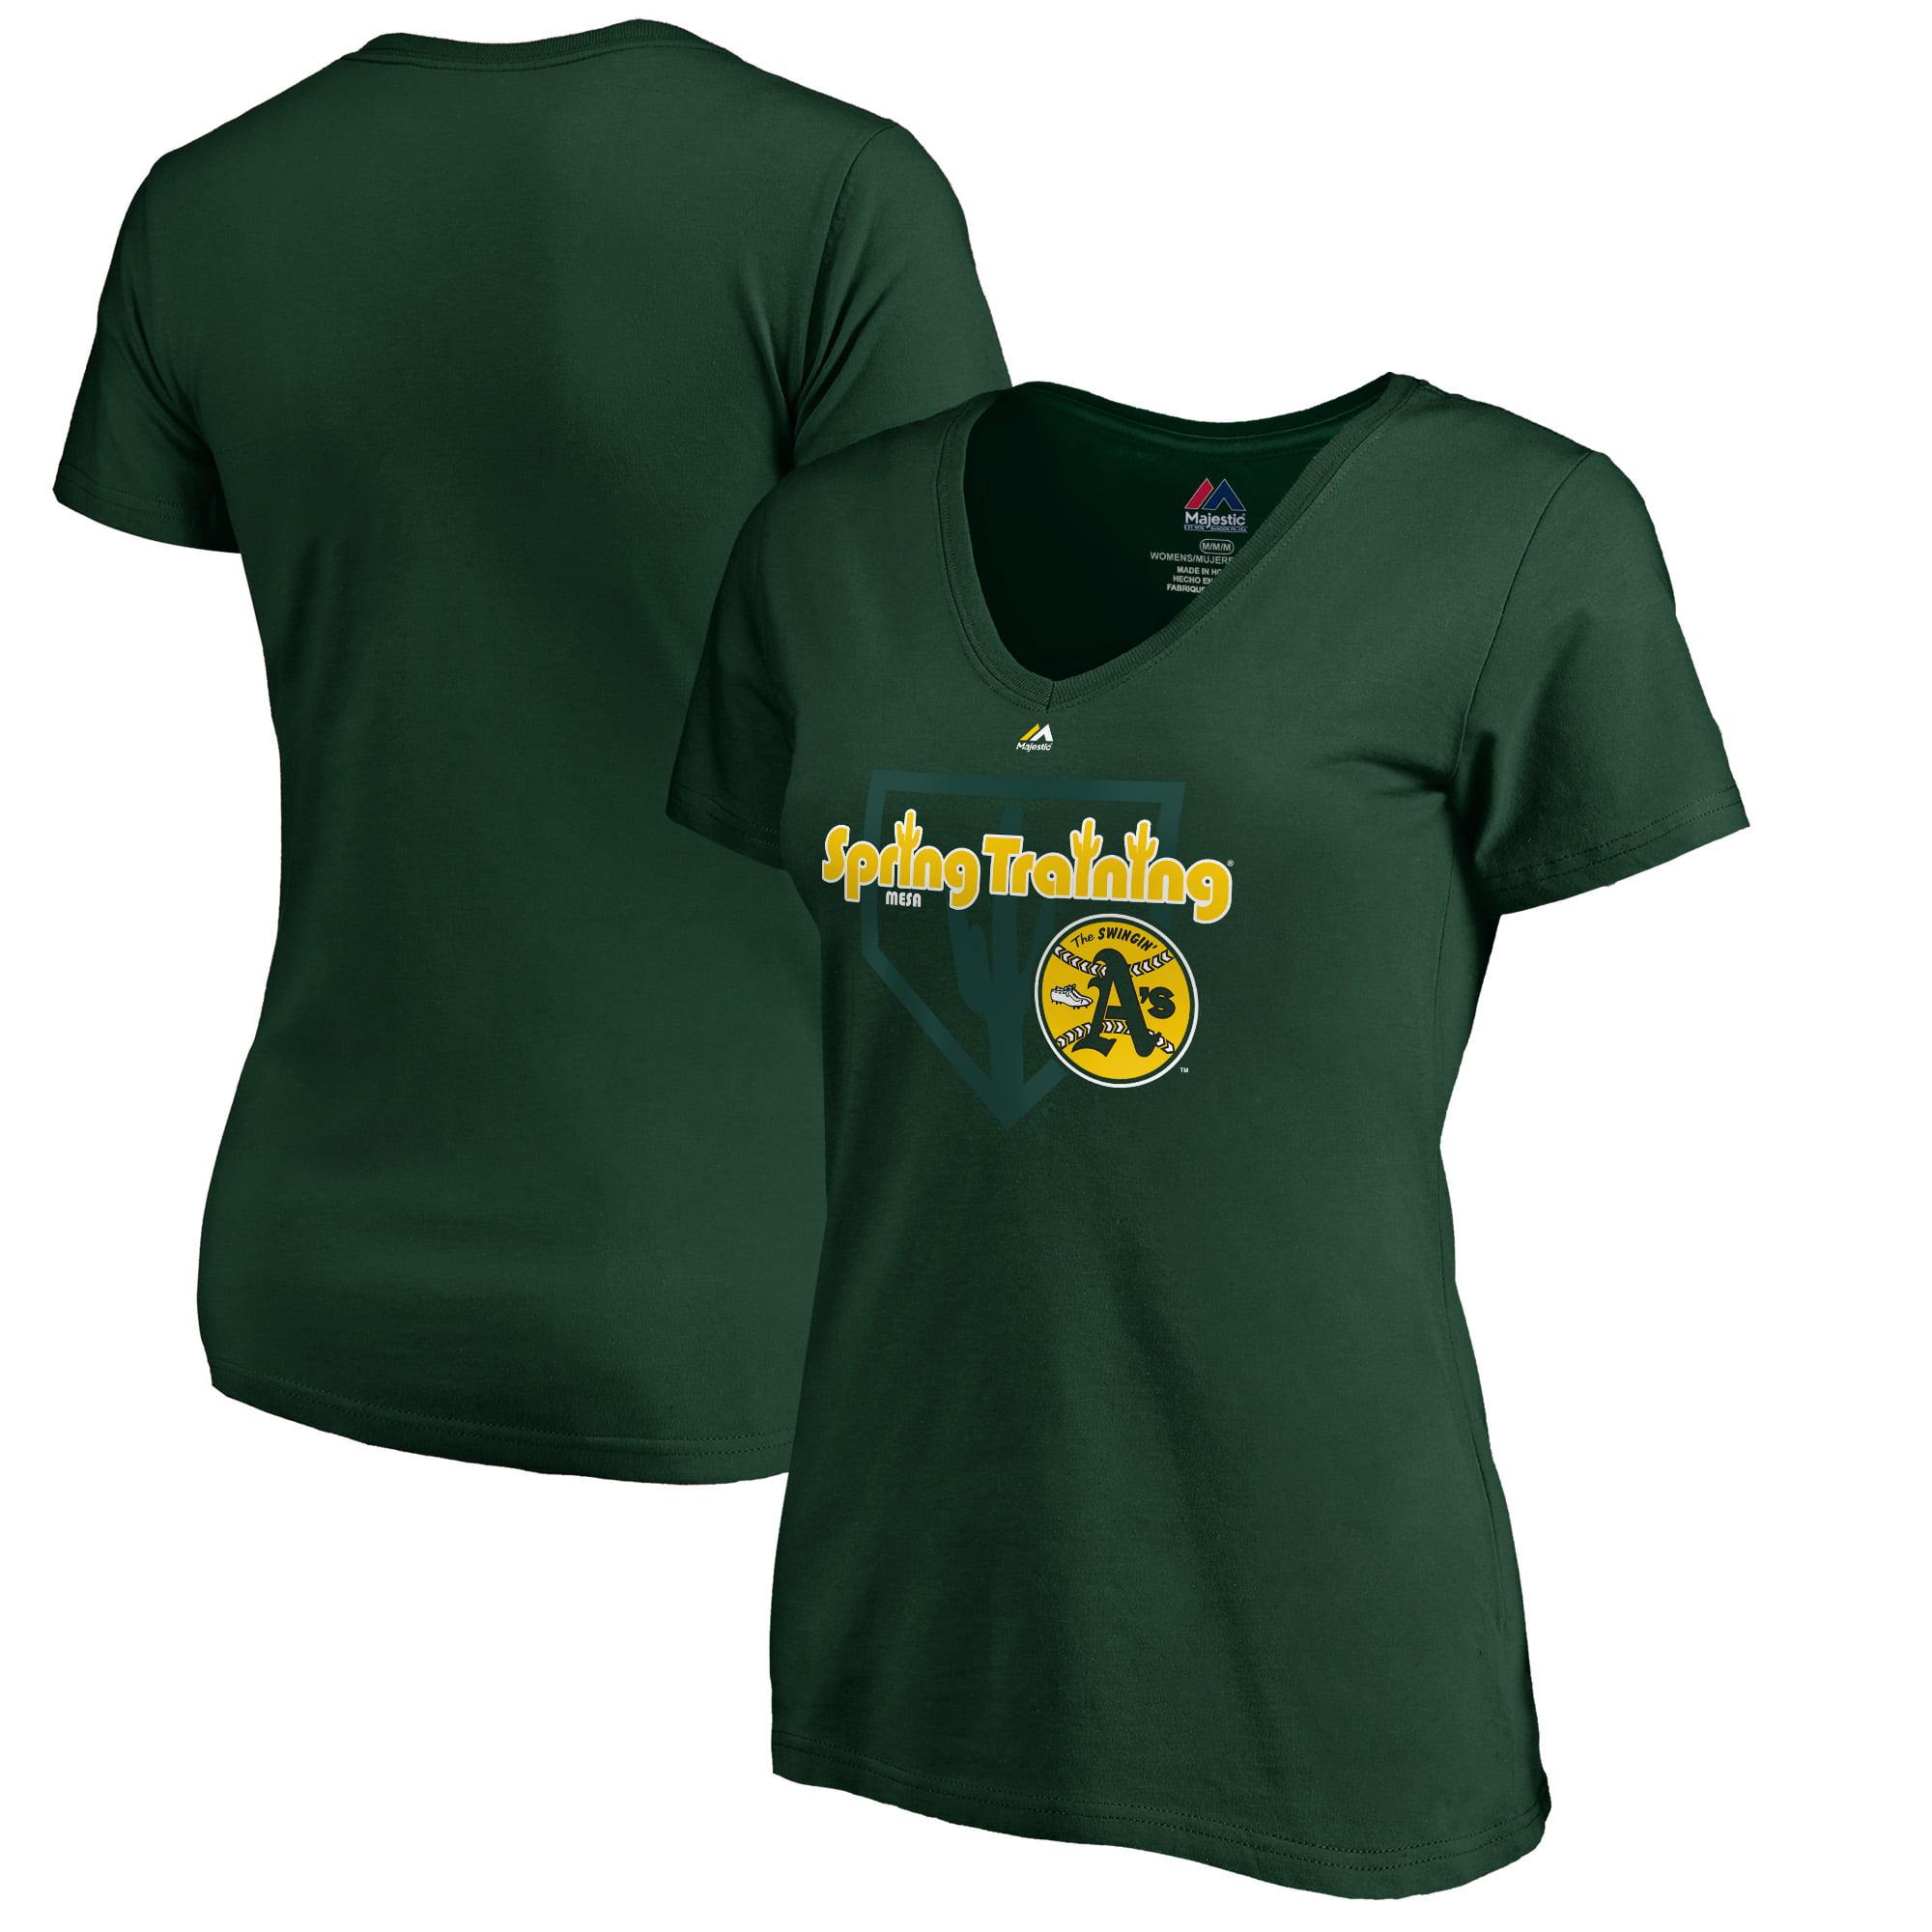 Oakland Athletics Majestic Women's 2019 Spring Training Vintage V-Neck T-Shirt - Green